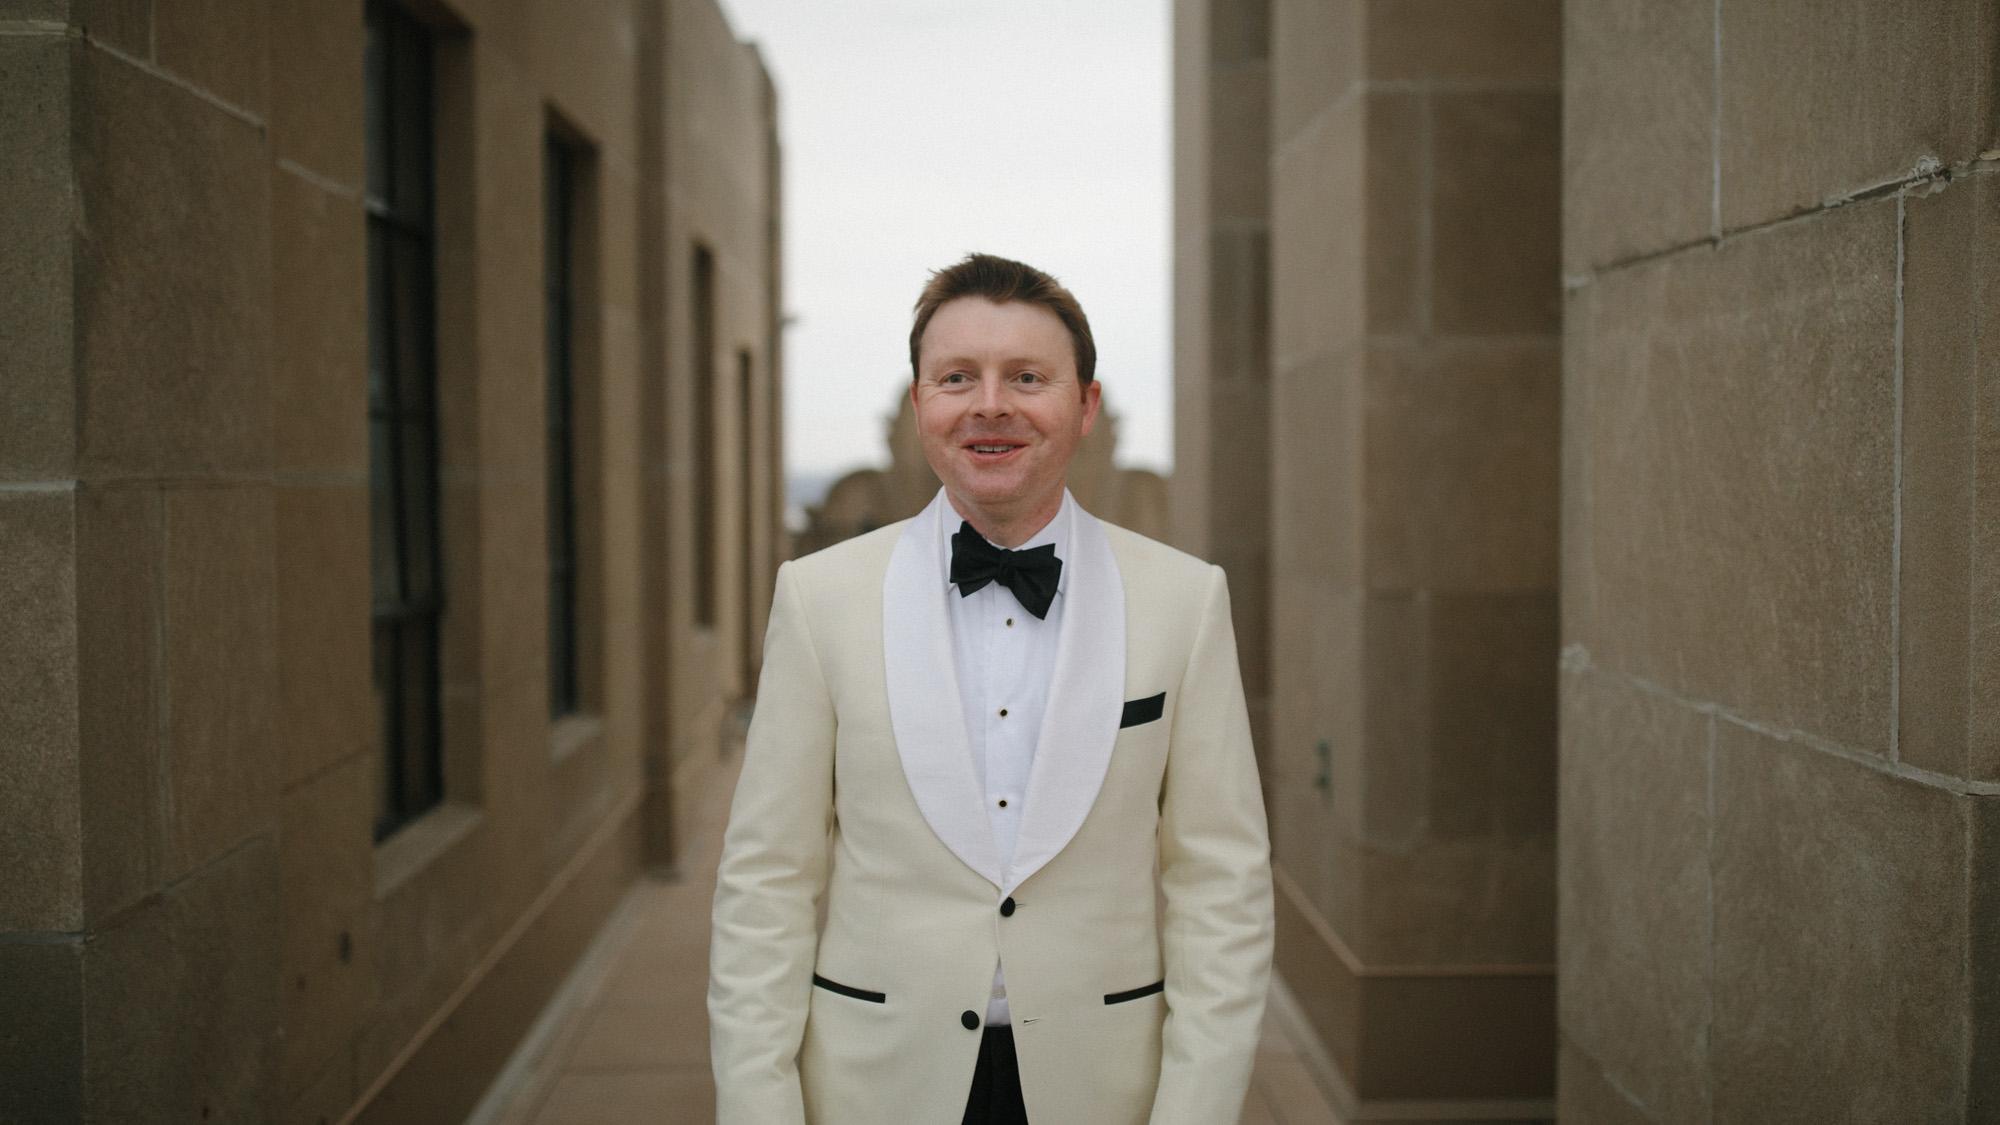 Alec_Vanderboom_kansas_city_hip_wedding_photos-0075.jpg